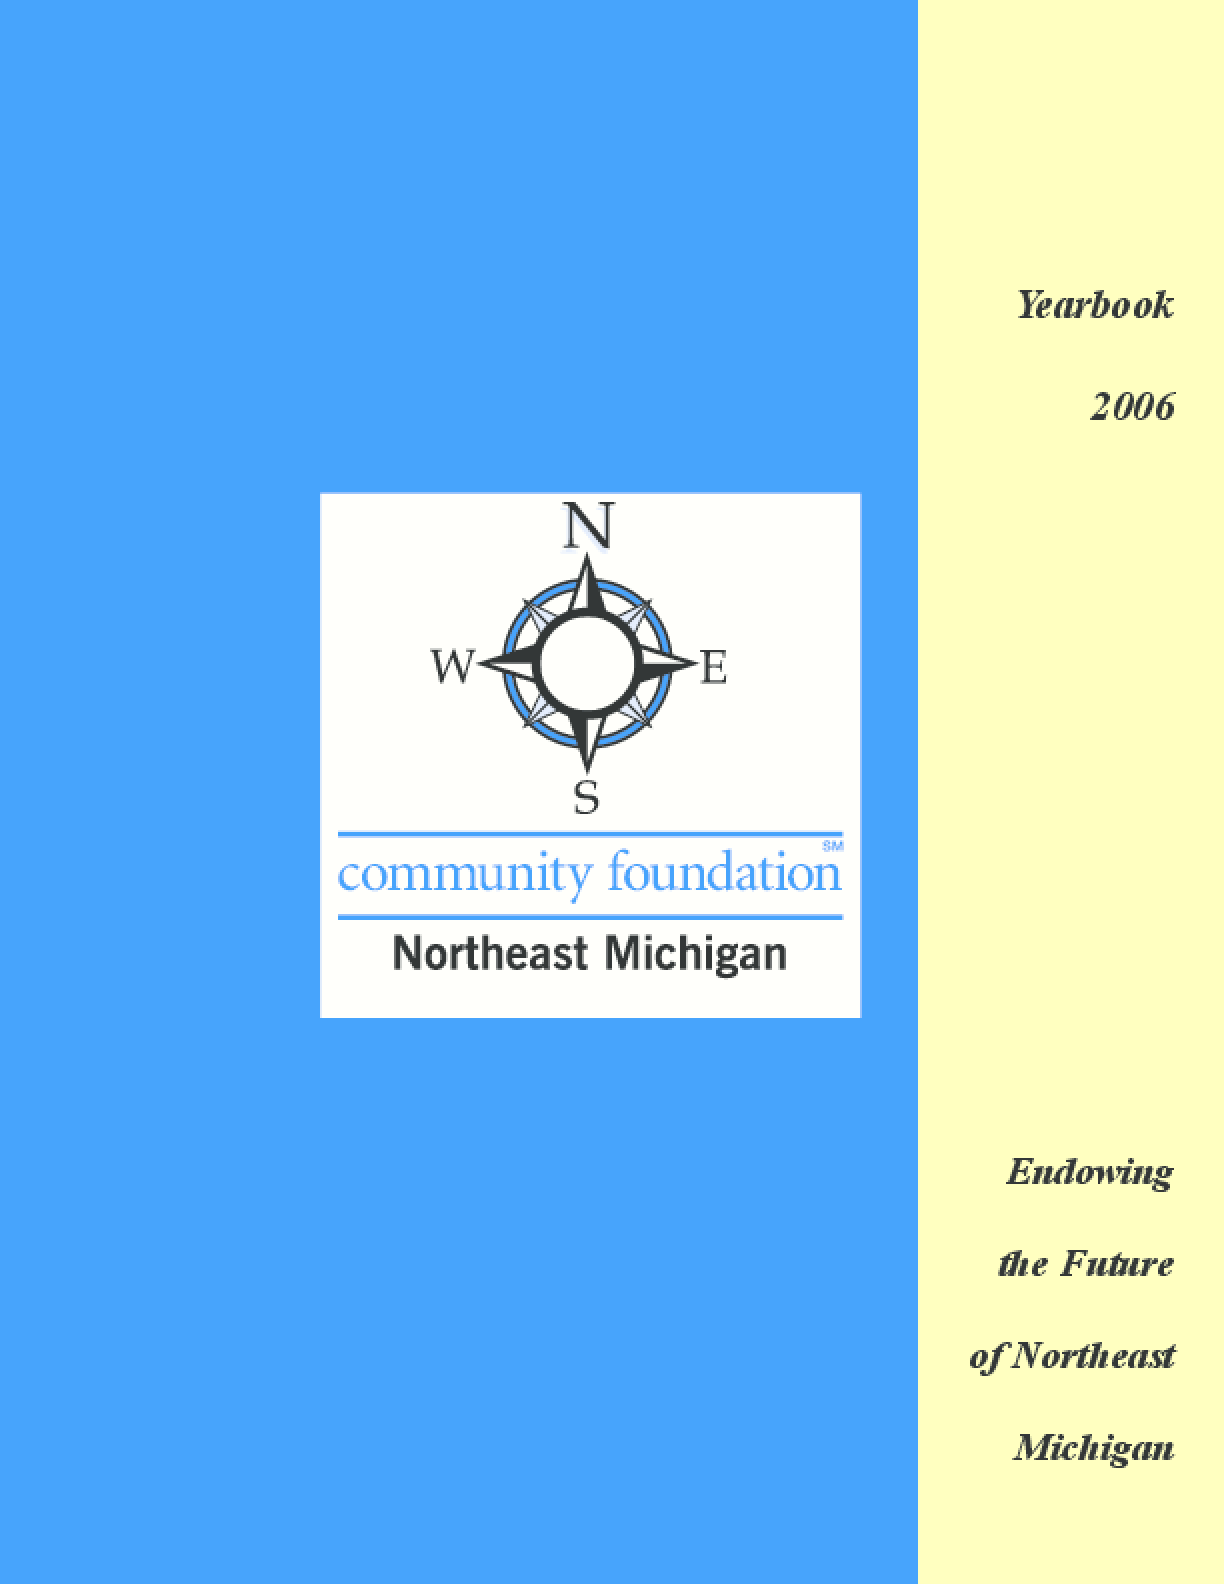 Community Foundation for Northeast Michigan - 2006 Annual Report